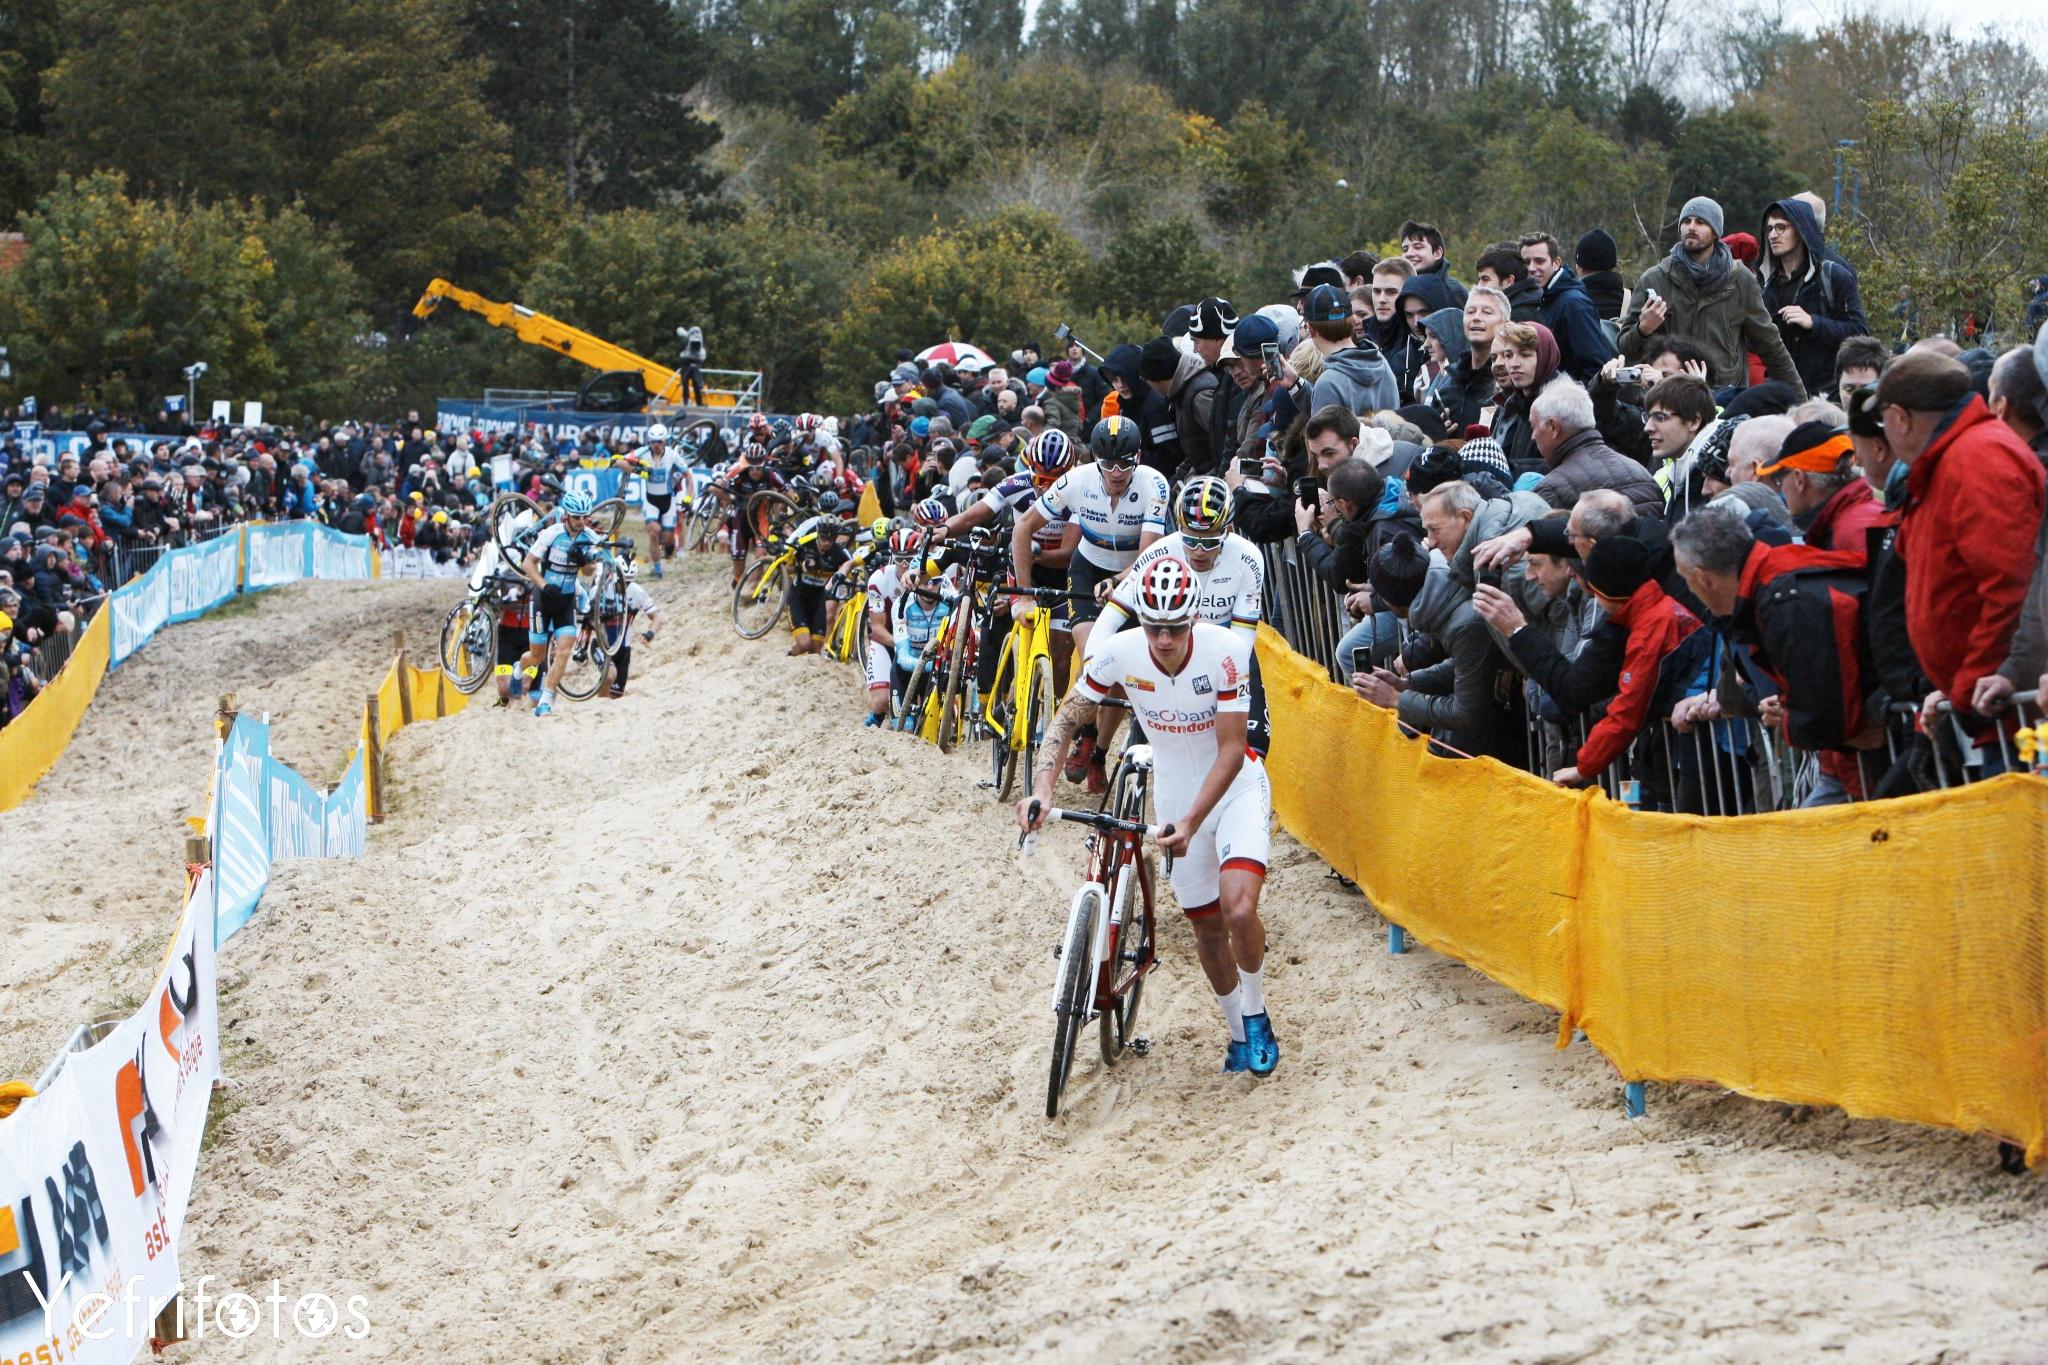 Koksijde - UCI Cyclocross World Cup - Mathieu van der Poel - Peloton